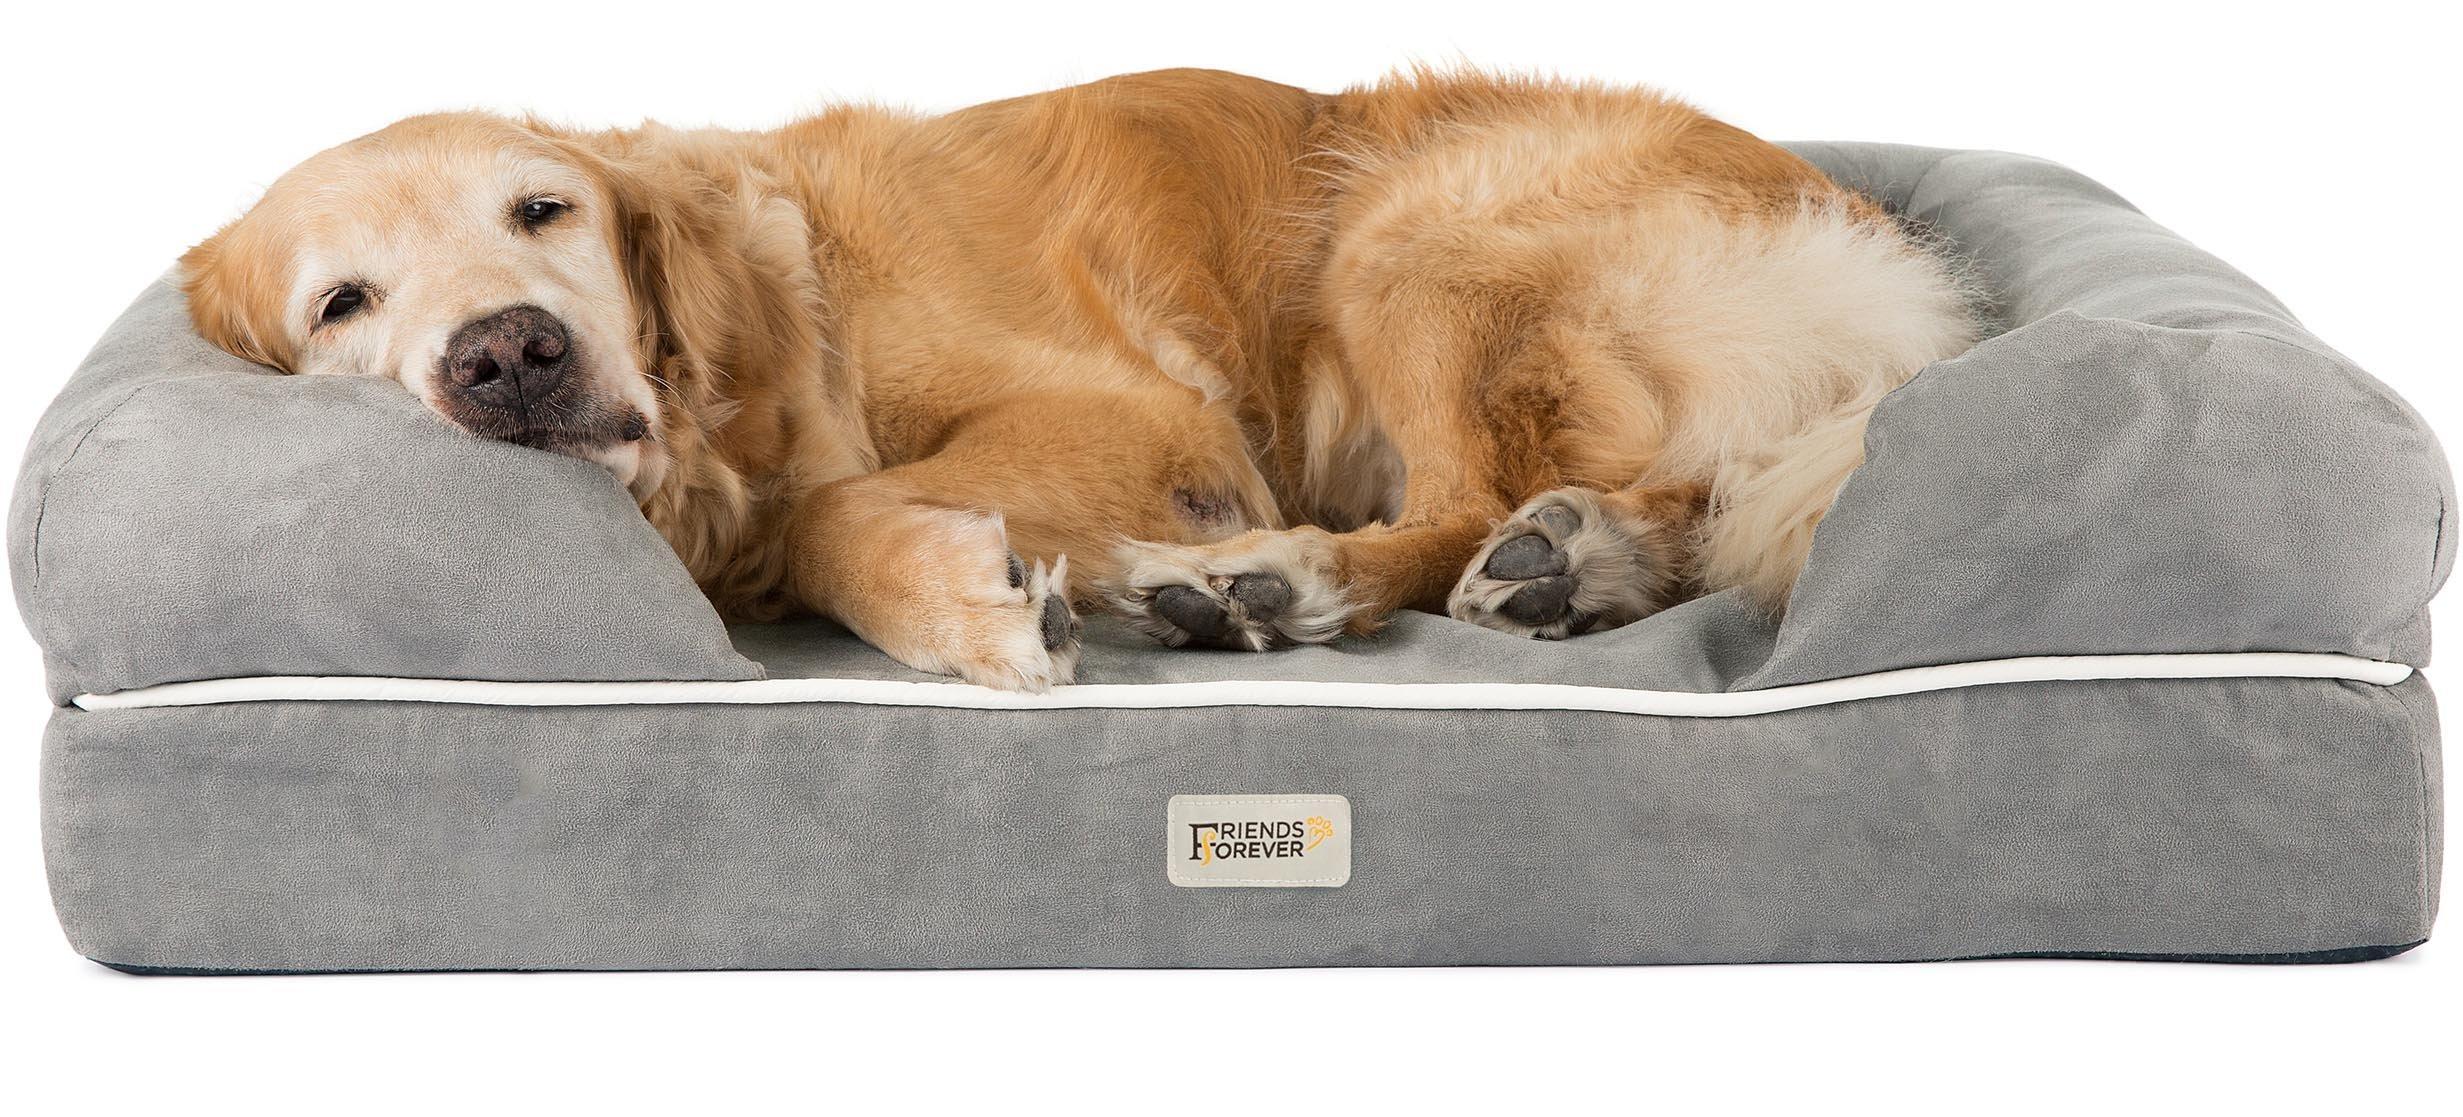 best rated in dog beds helpful customer reviews. Black Bedroom Furniture Sets. Home Design Ideas